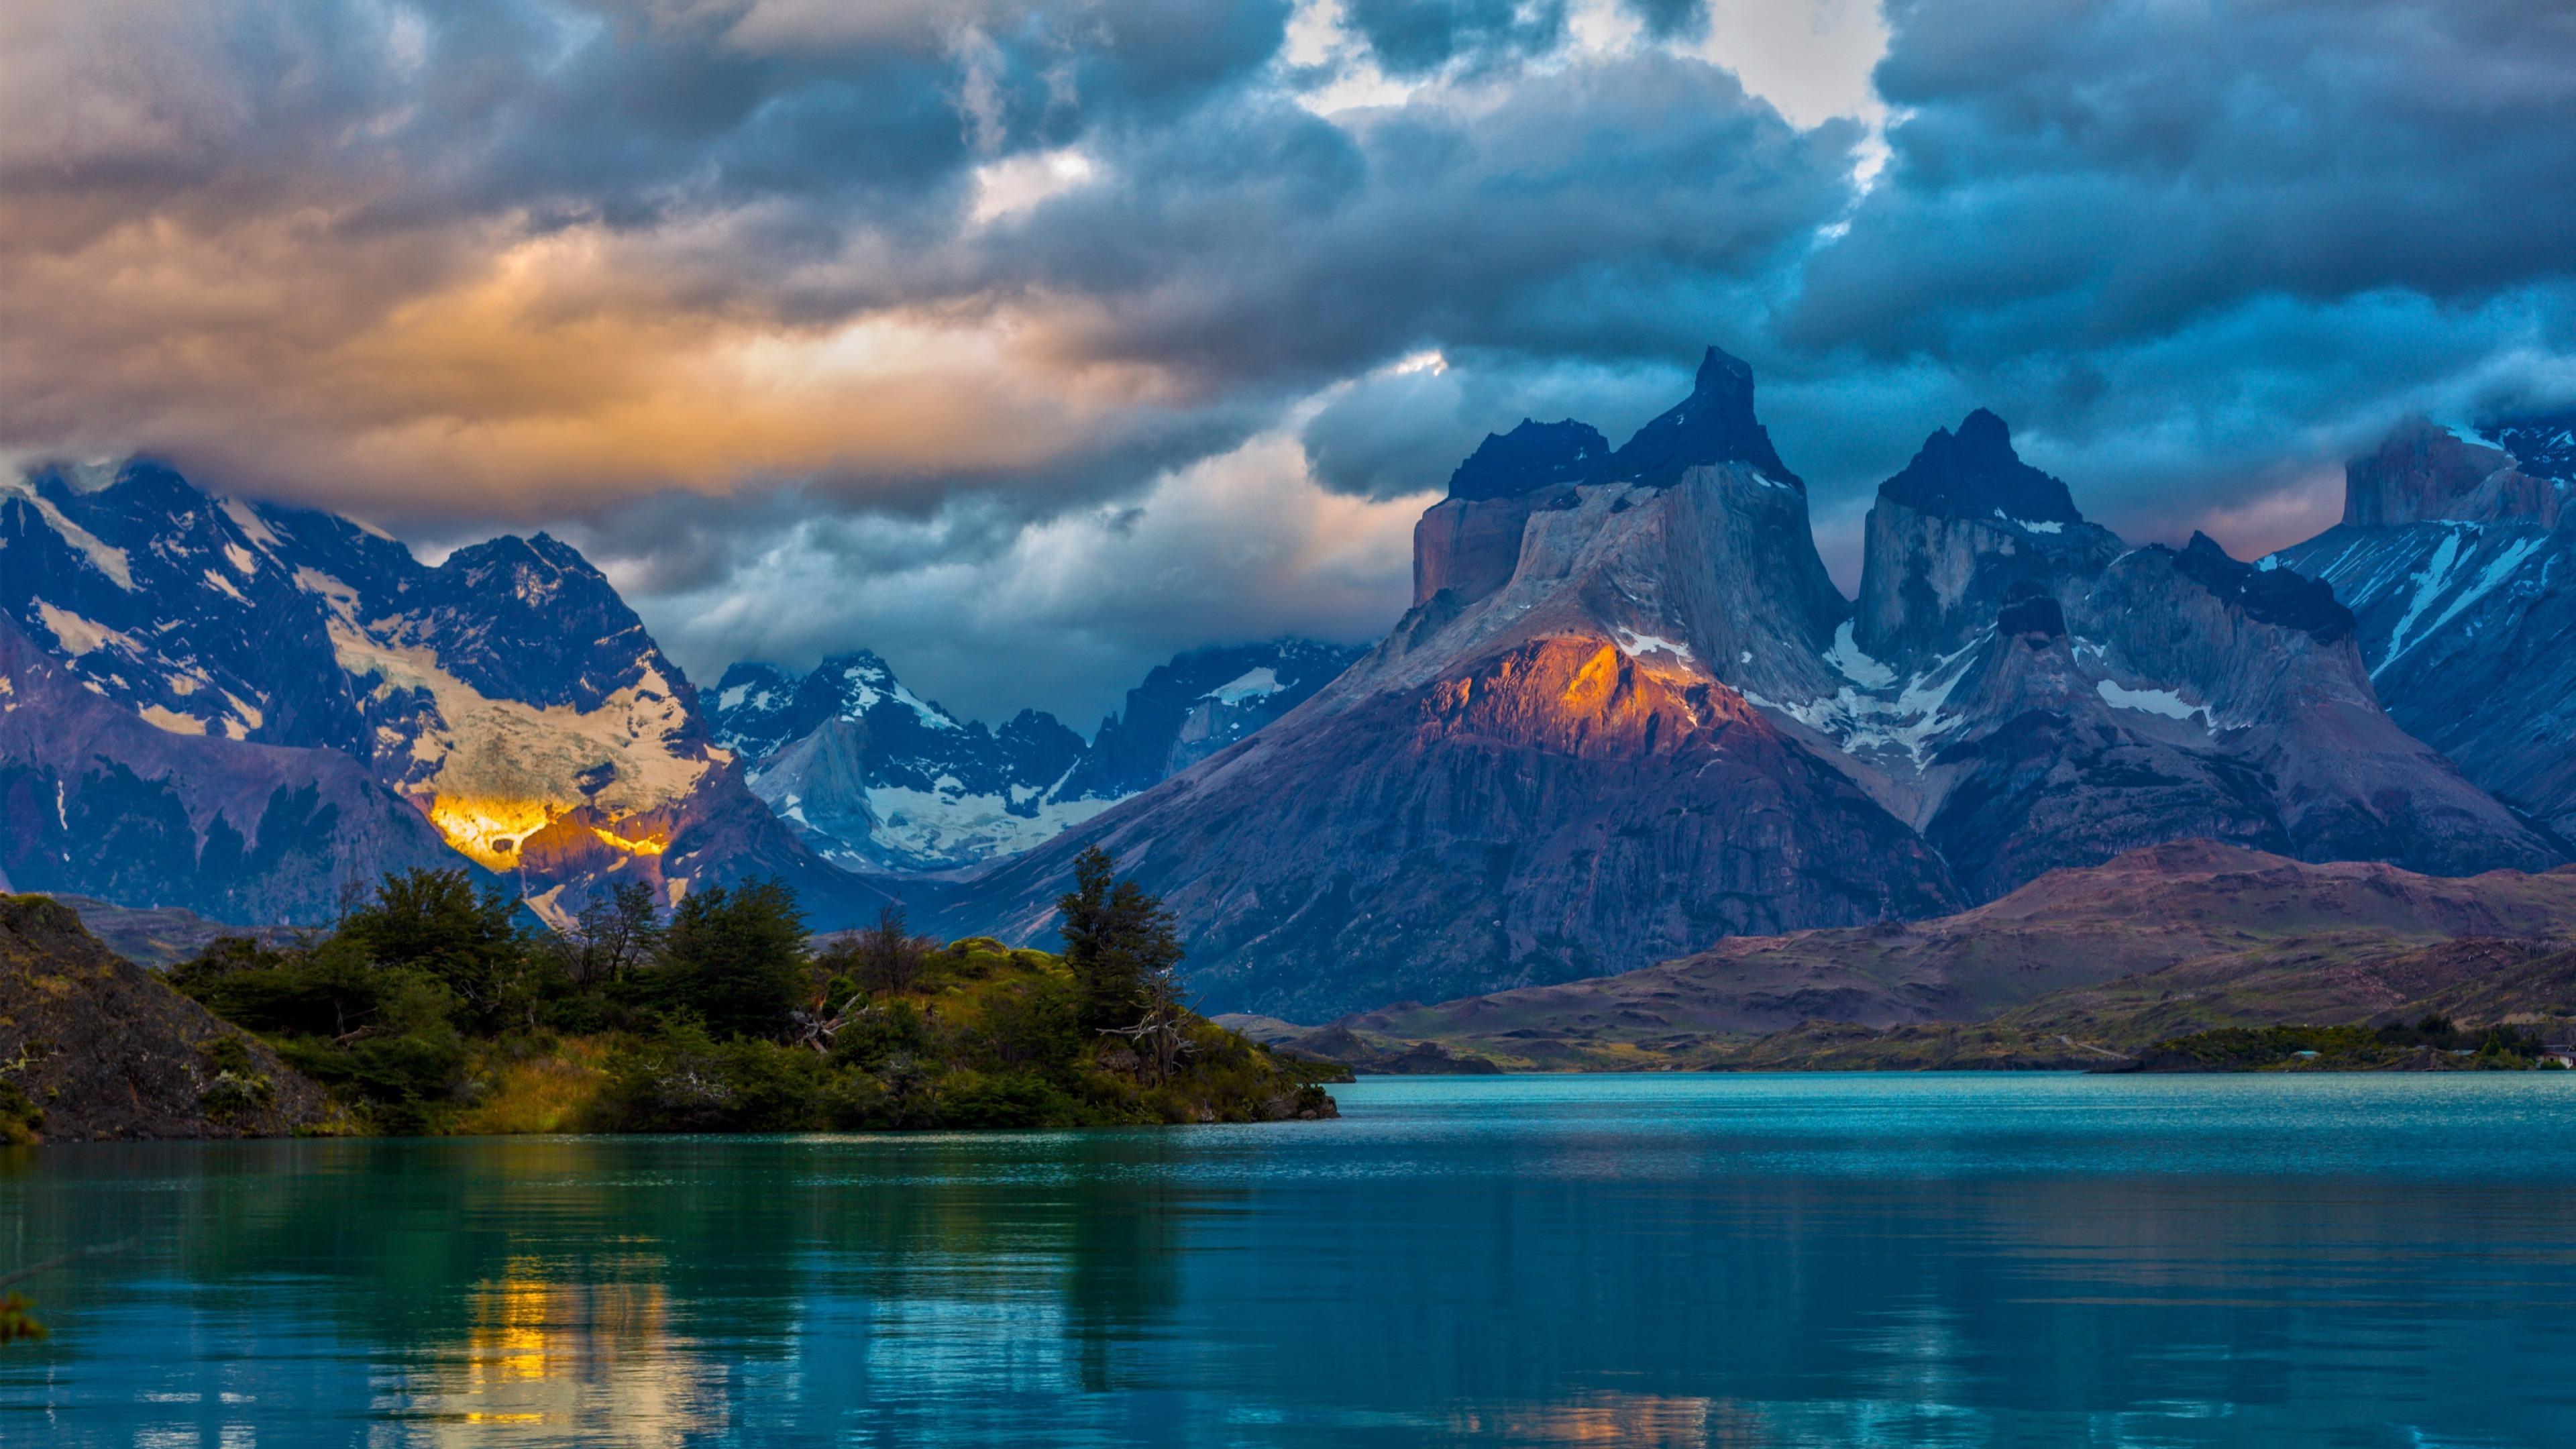 Los Glaciares National Park - Patagonia, Chile wallpaper